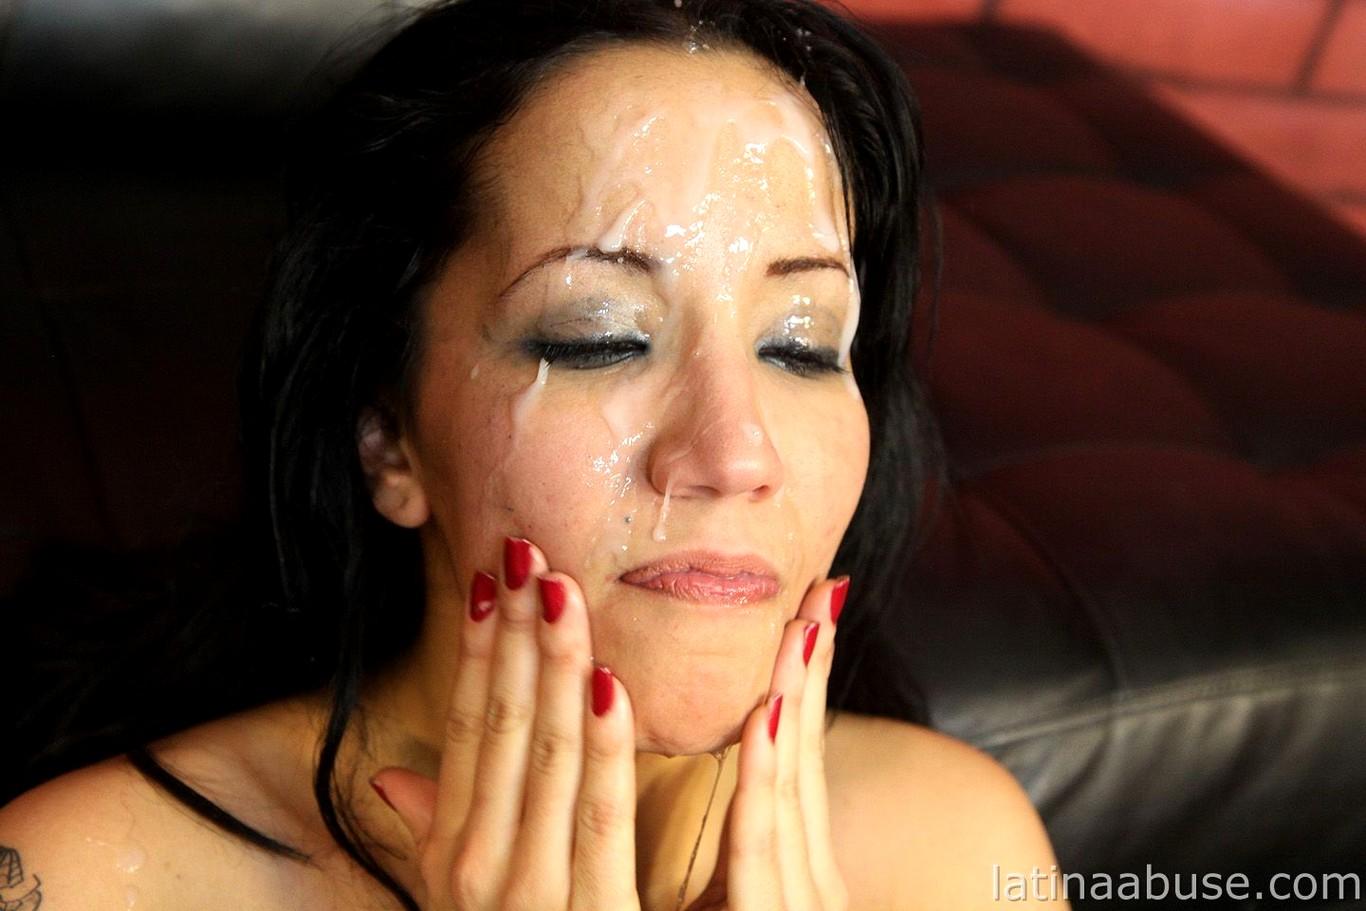 Latina abuse josephine nice extreme facial